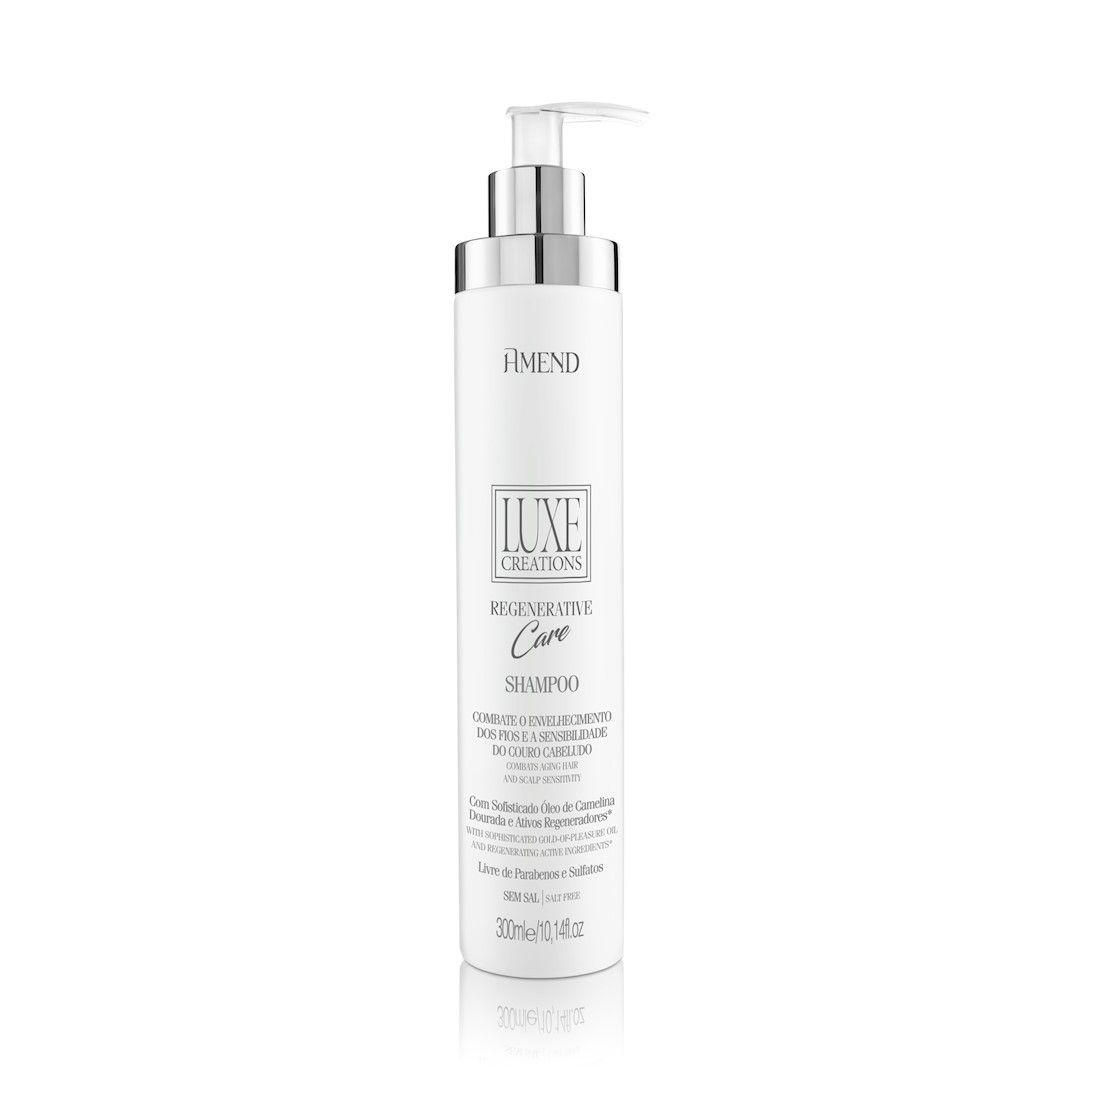 Amend Shampoo Luxe Creations Regenerative Care 300mL